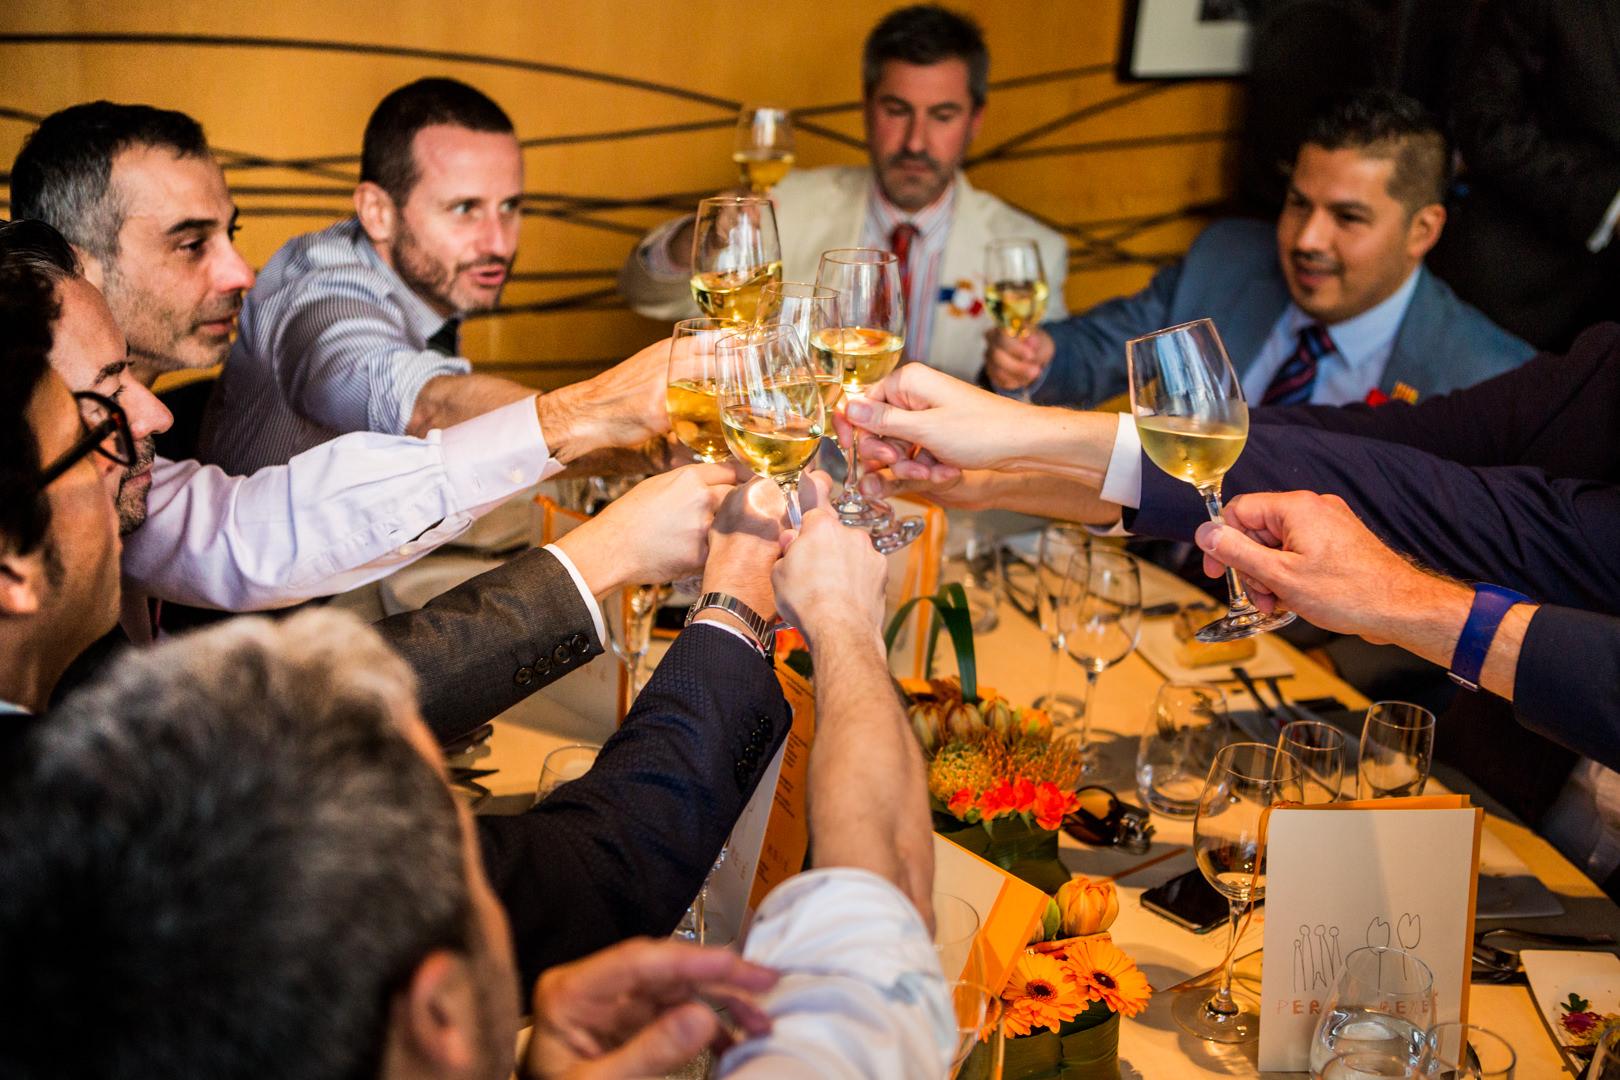 Same-sex-wedding-barcelona-boda- gay-samesex-engagement-Rafael-Torres-fotografo-bodas-sevilla-madrid-barcelona-wedding-photographer--49.jpg